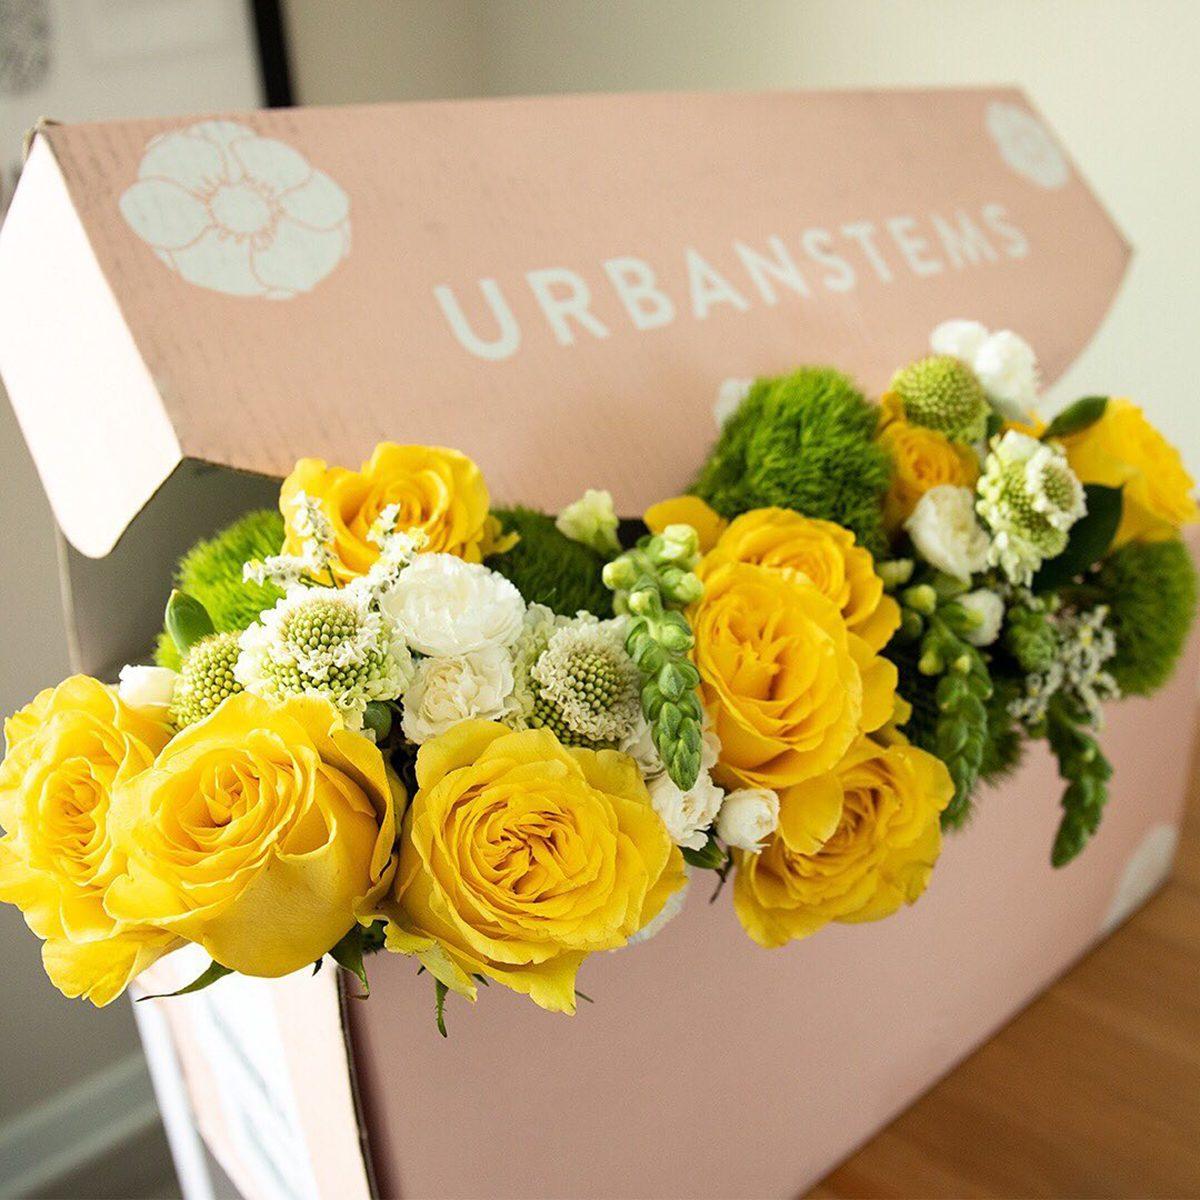 Urban Stems bouquet